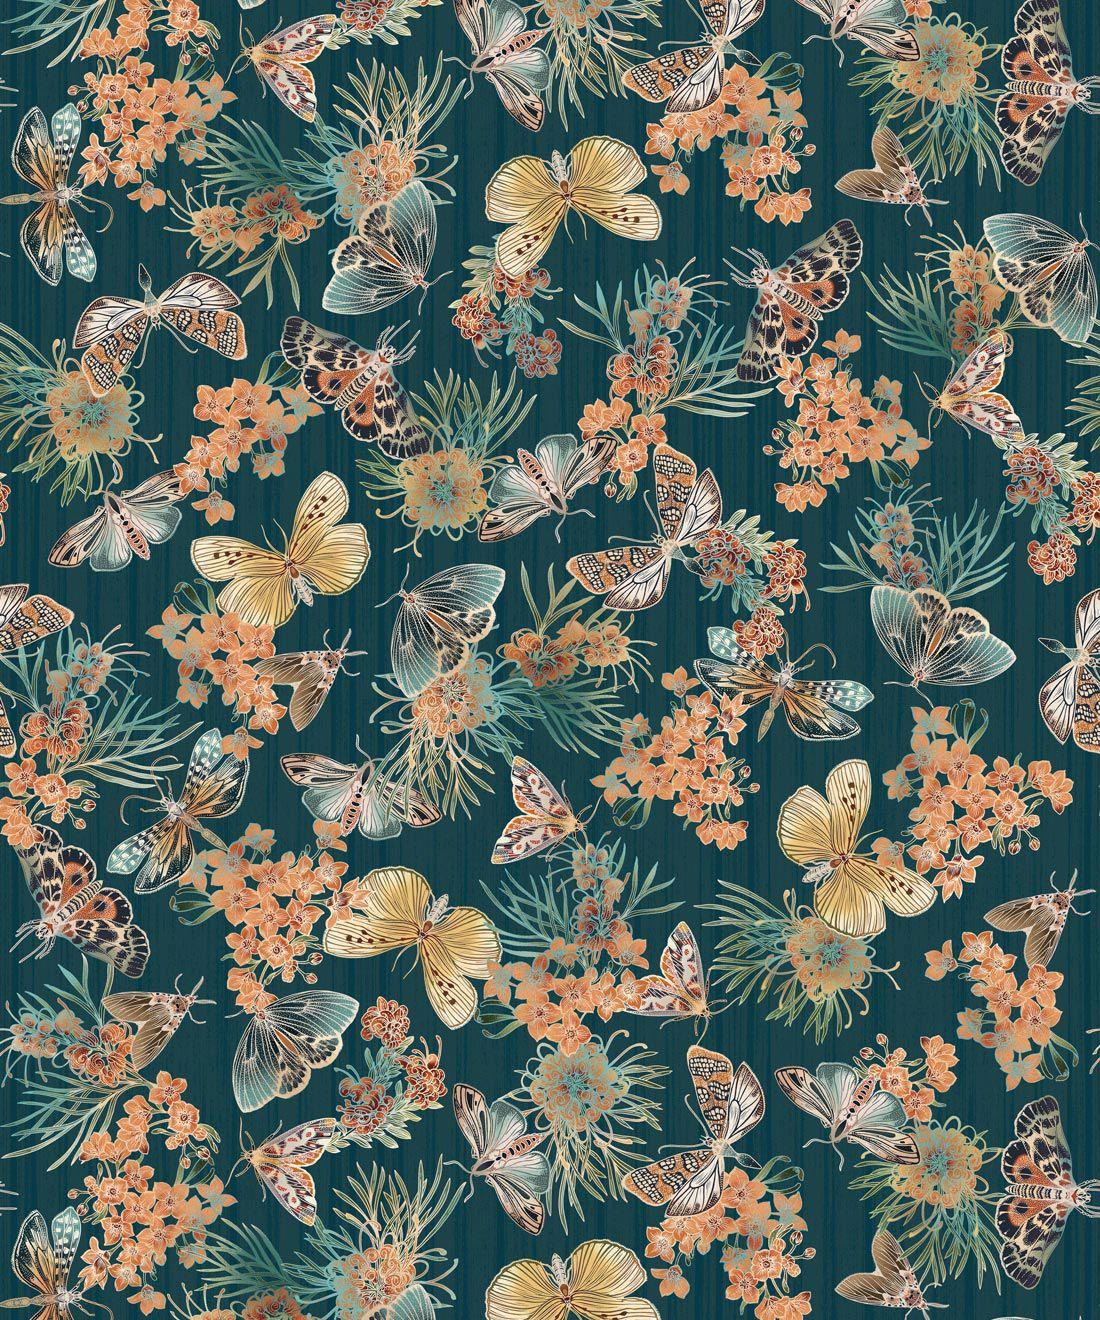 Moth Wallpaper • Eloise Short • Vintage Floral Wallpaper •Granny Chic Wallpaper • Grandmillennial Style Wallpaper •Deep Ocean •Swatch